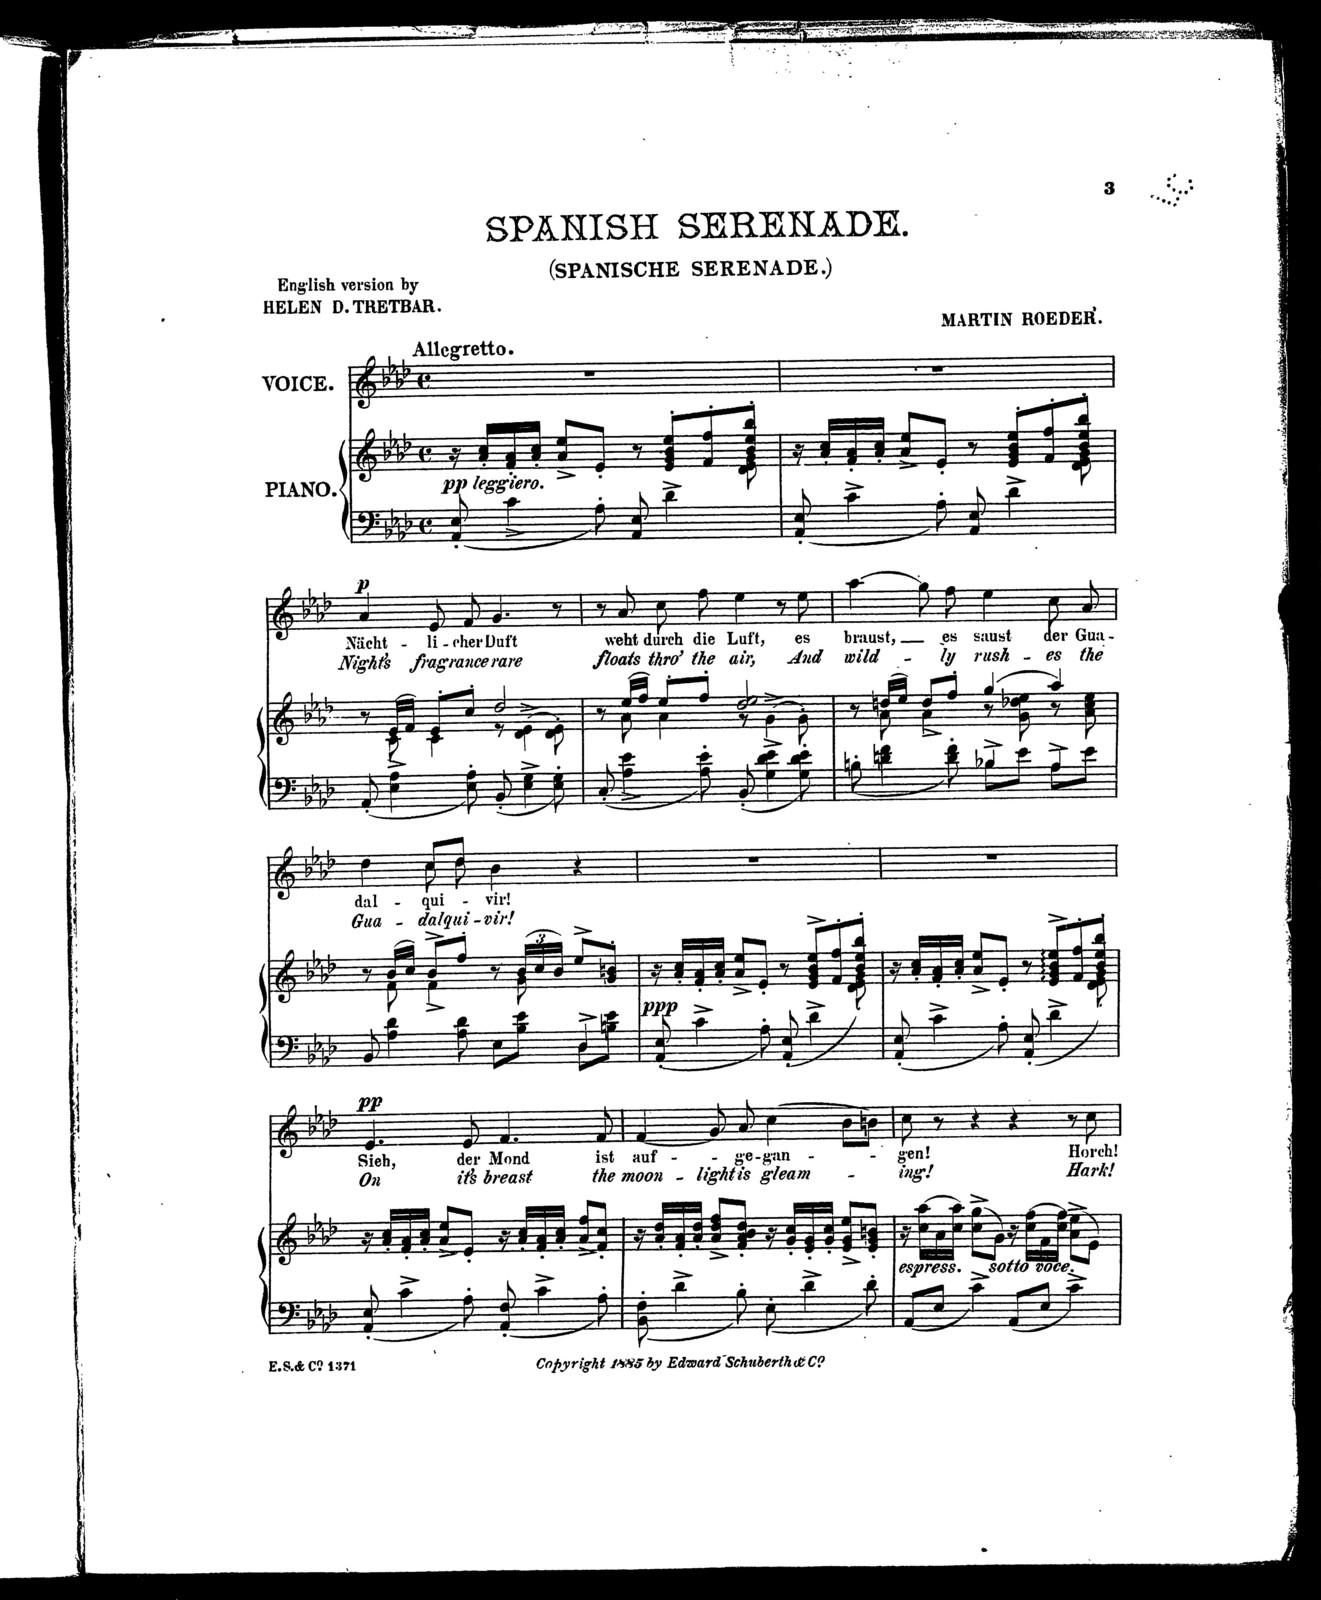 Spanish serenade - Spanische serenade - PICRYL Public Domain